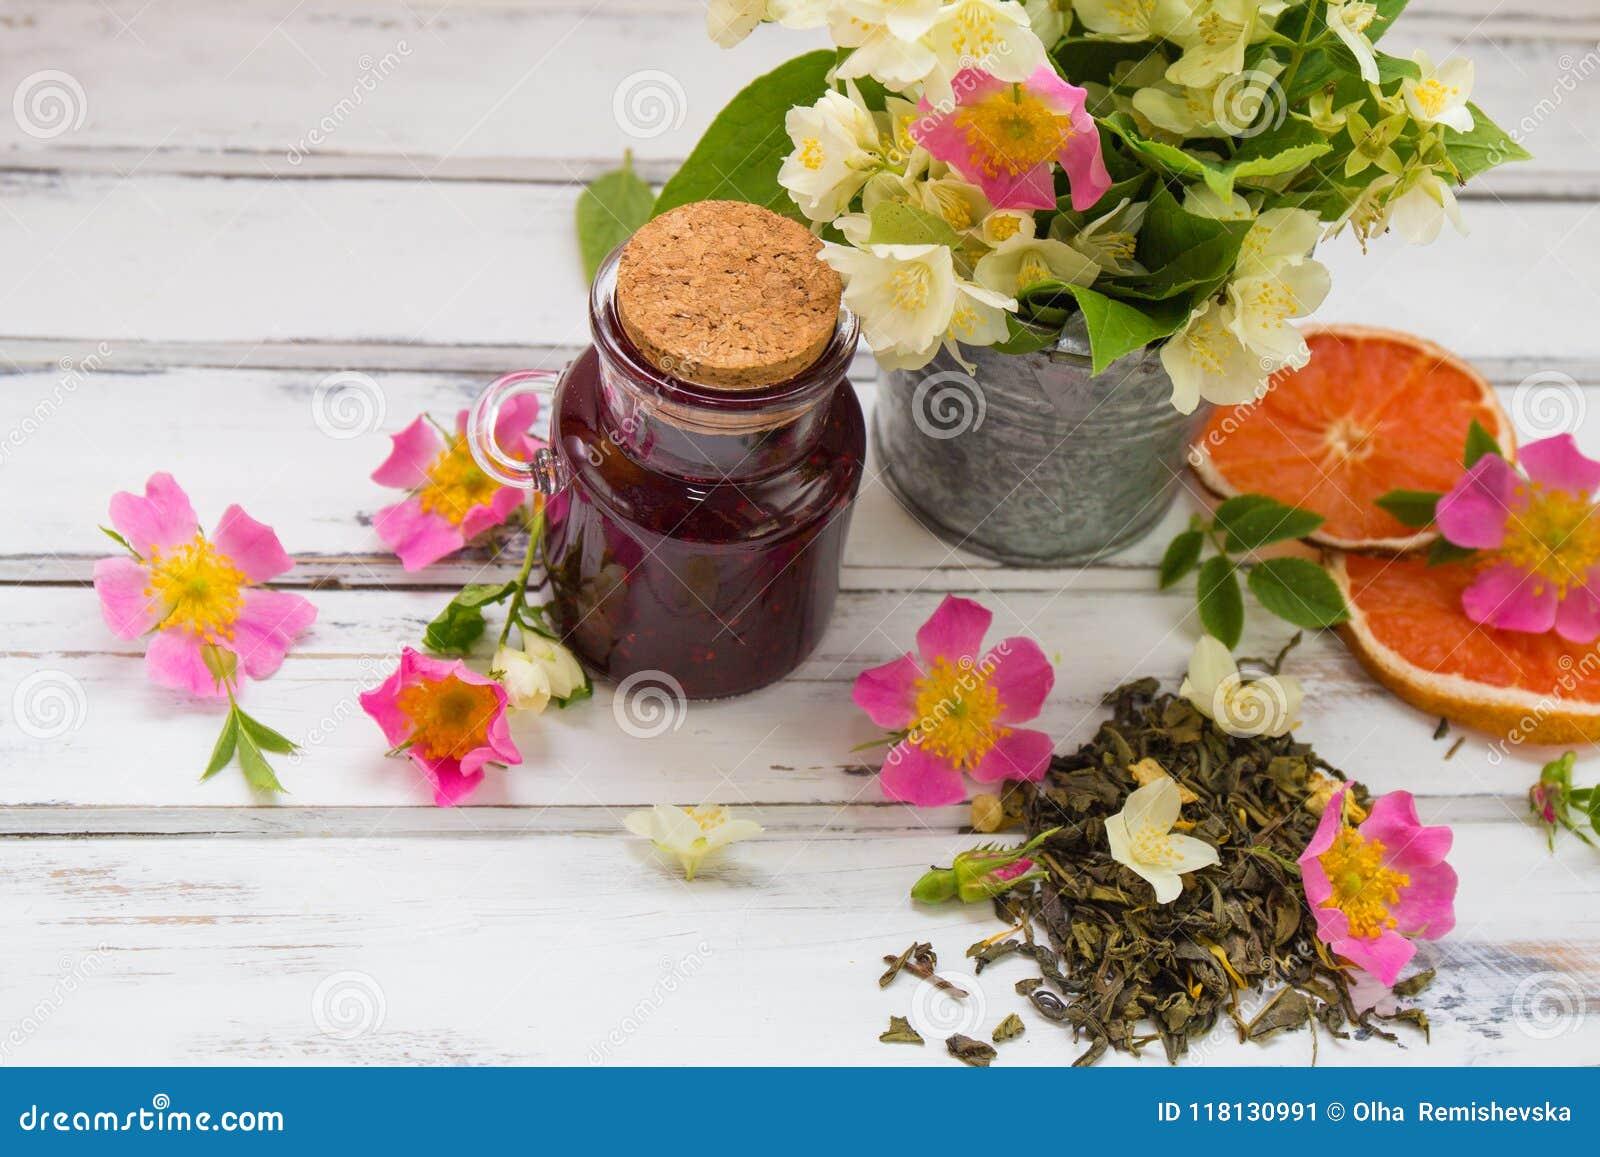 Jasmine Dry Green Tea Leaves With Jasmine Flowers With Flowers Of